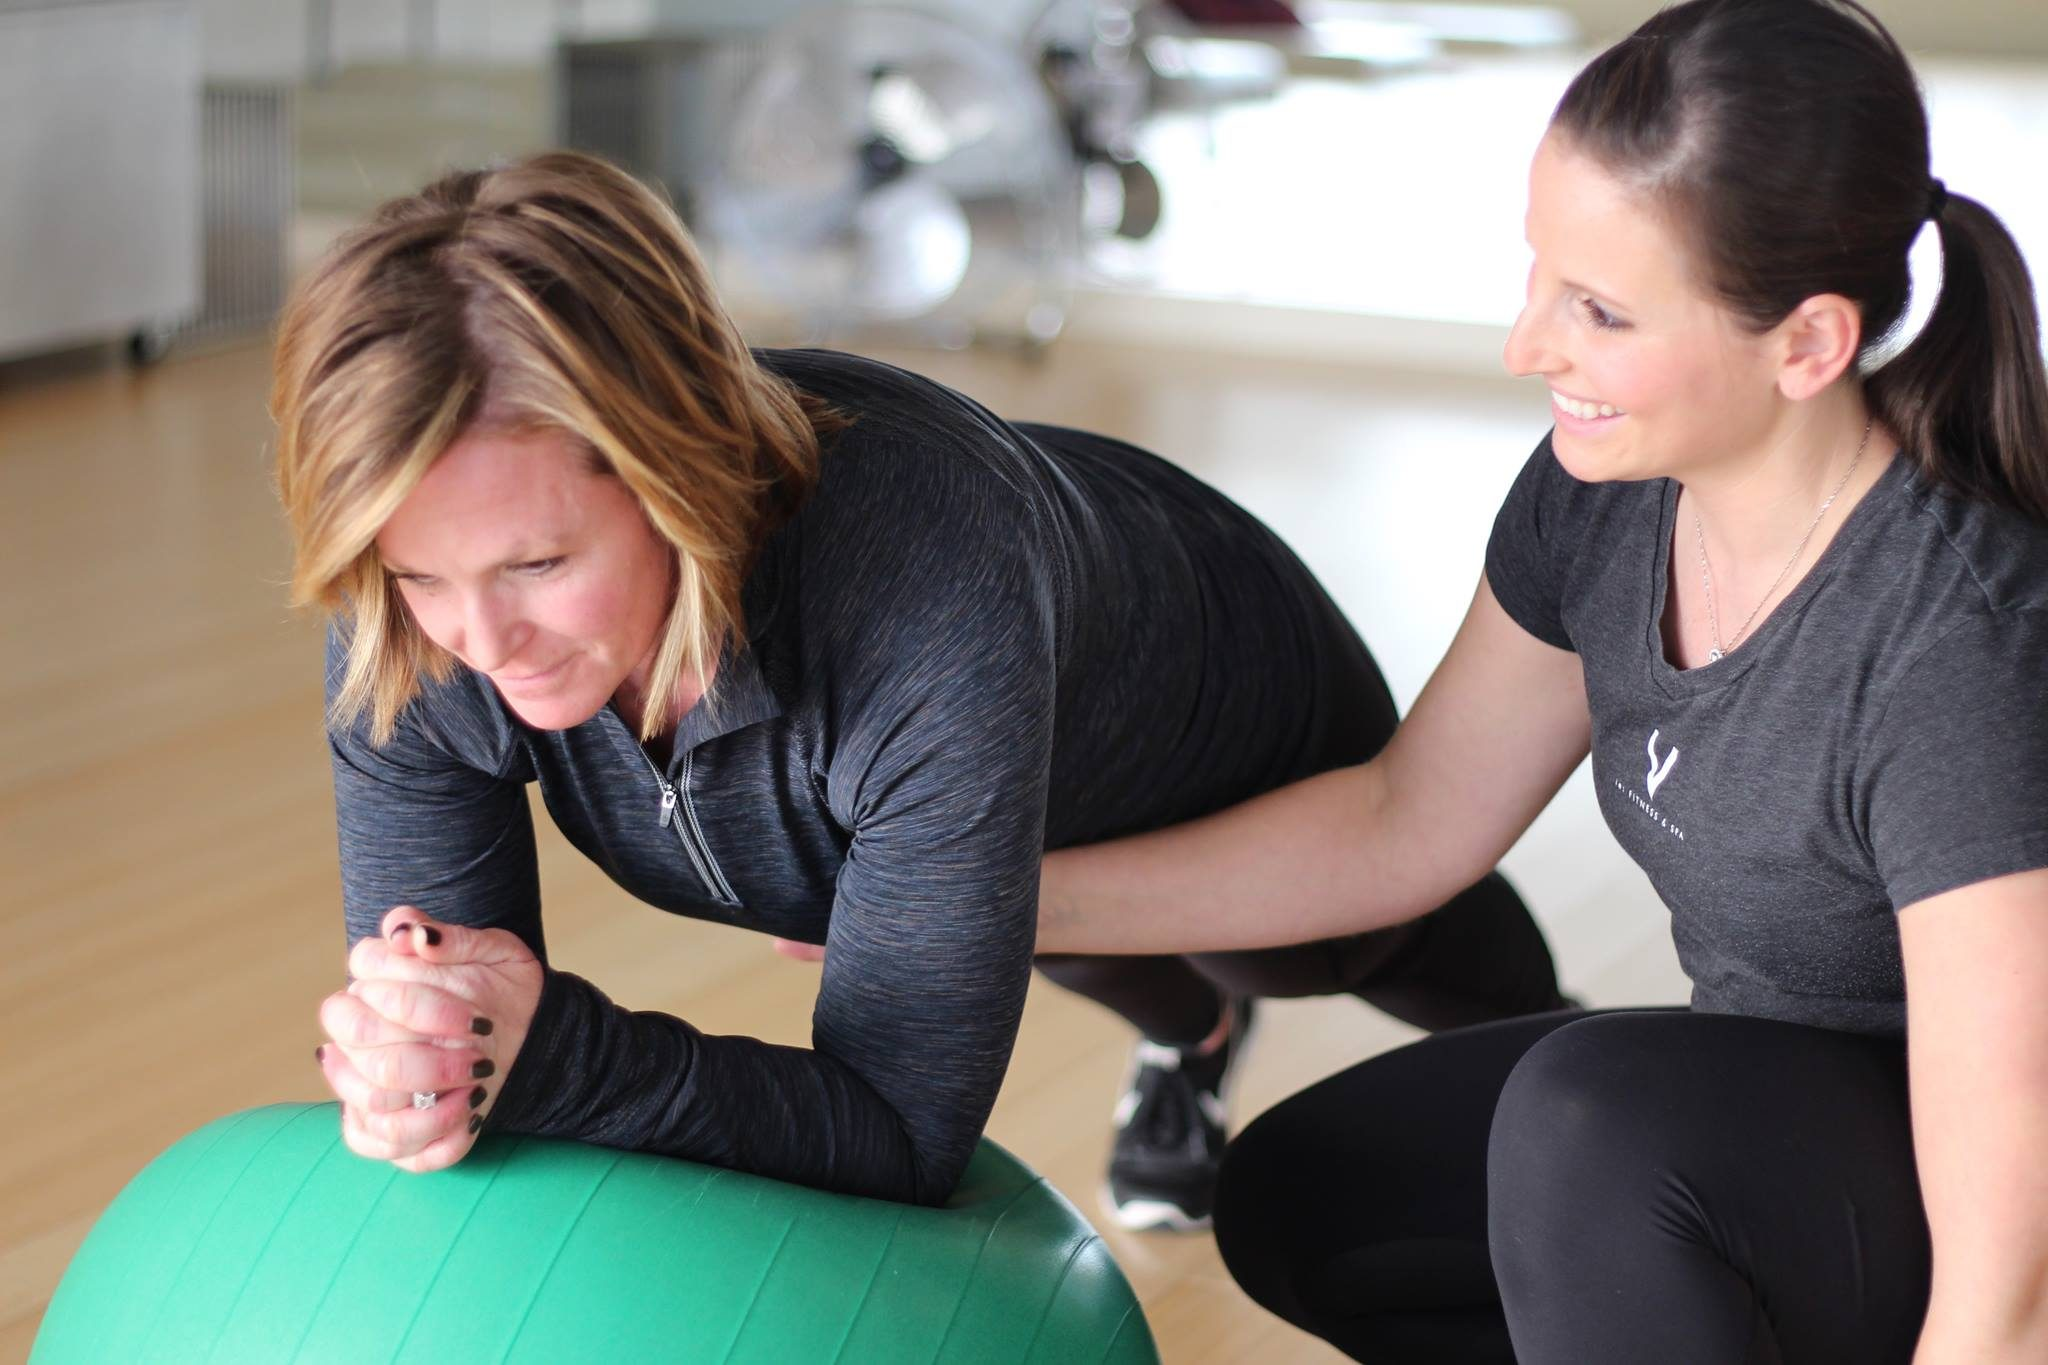 Vie | Personal Training Ann Arbor – Vie Fitness & Spa